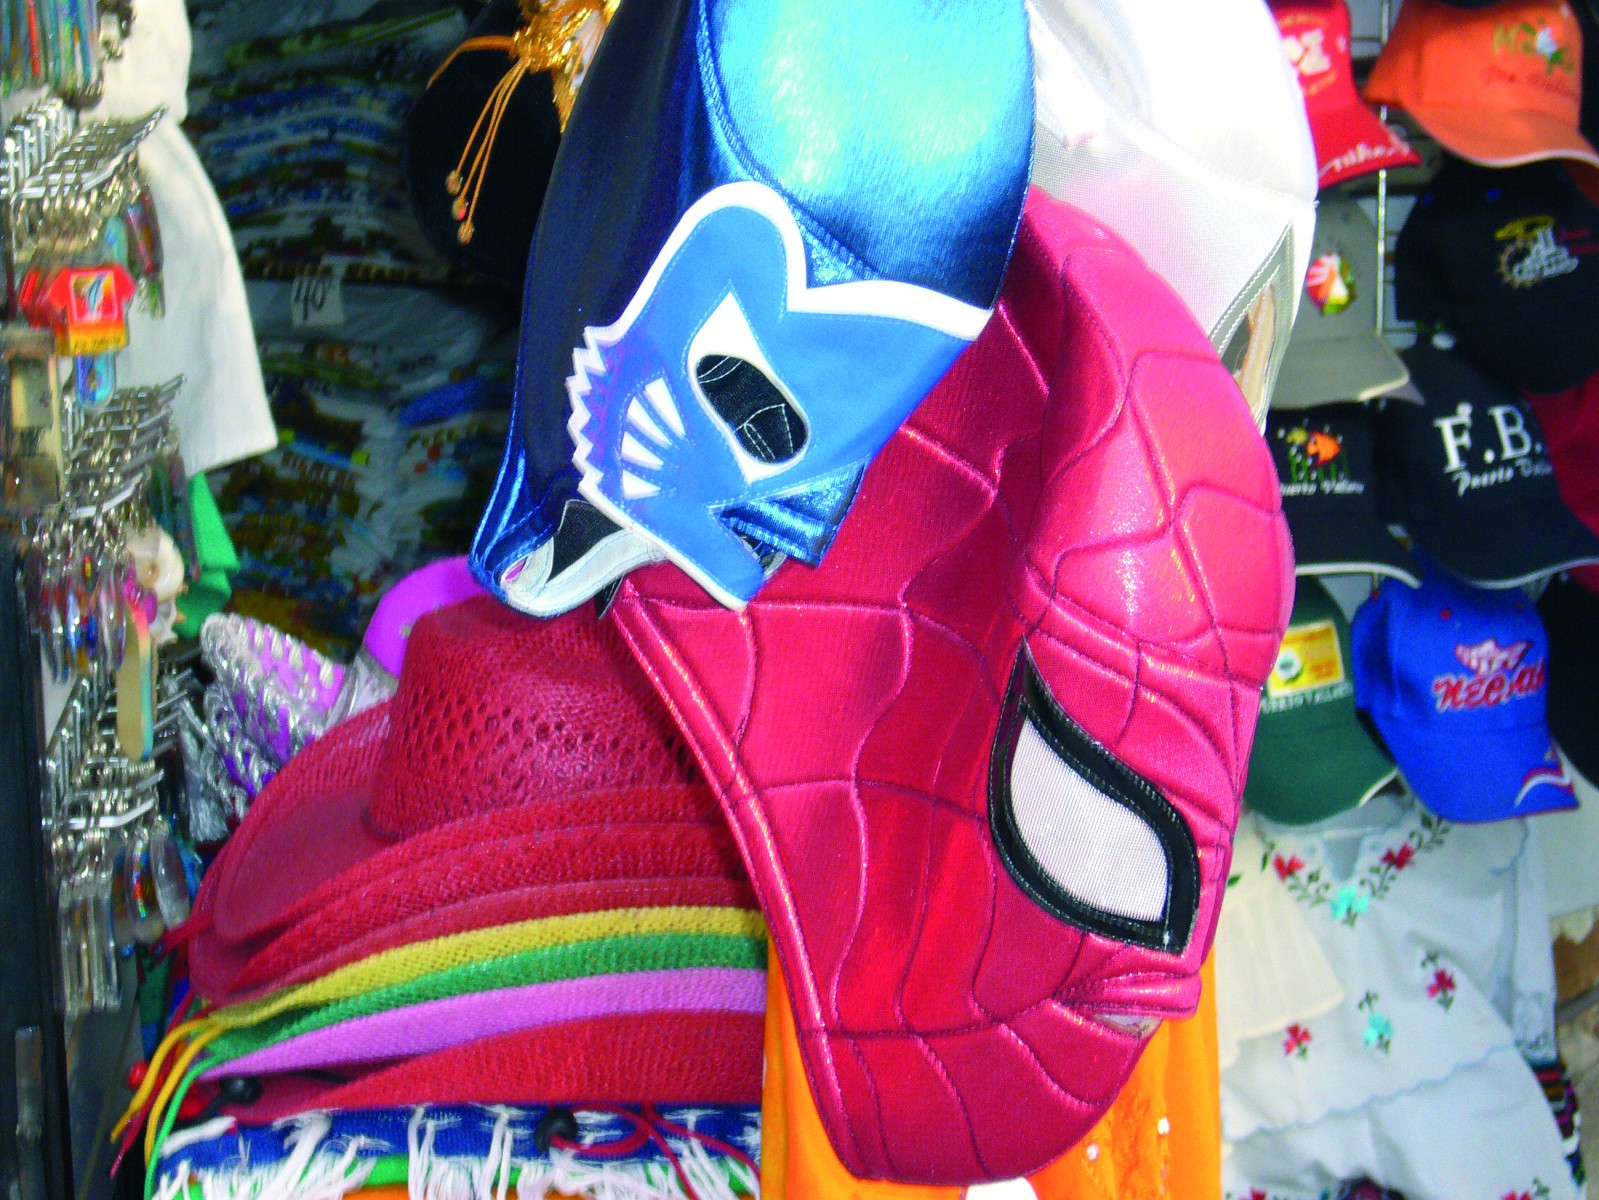 mex13-wrestling-masks-free-rafe